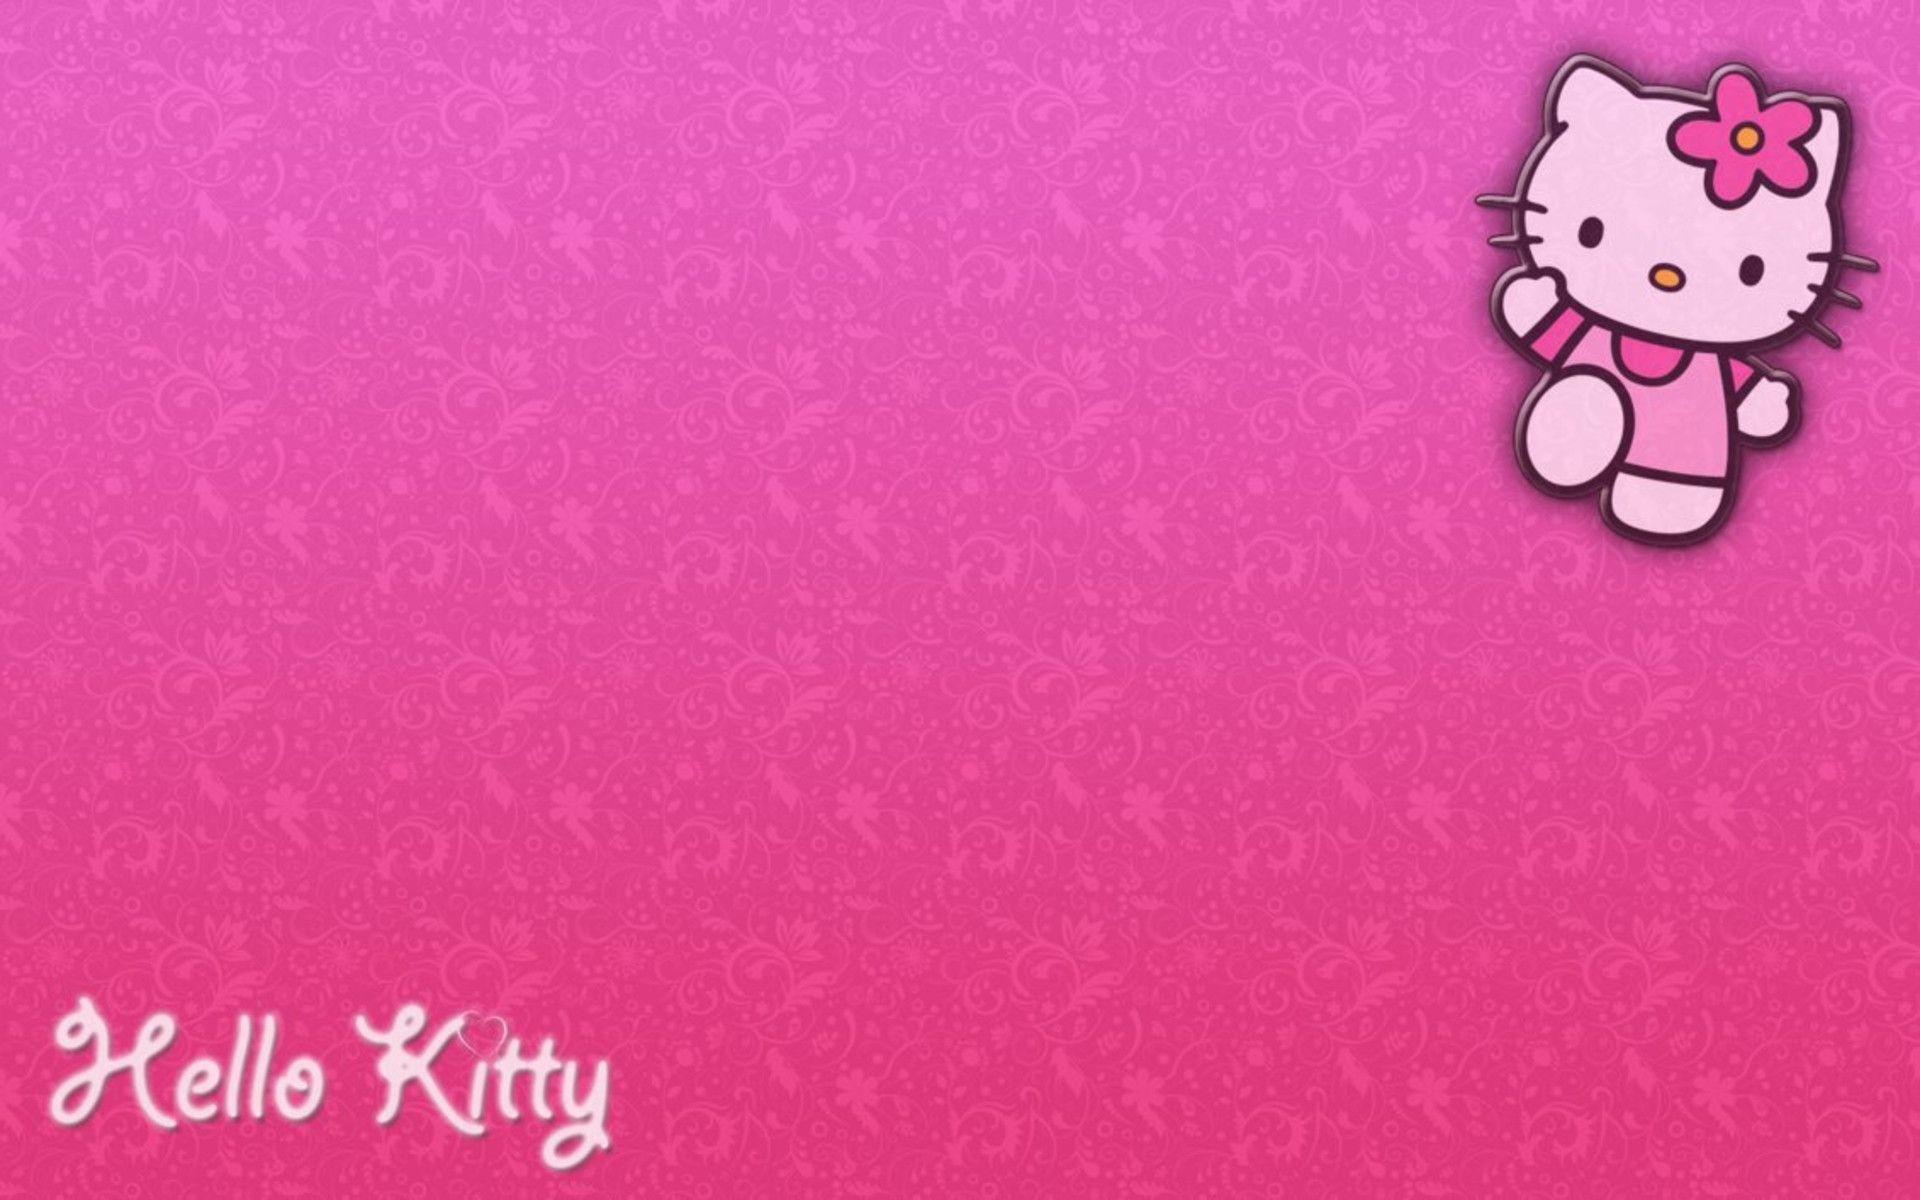 Beautiful Hello Kitty Birthday Wallpapers Wallpaper Cave Usefulresults